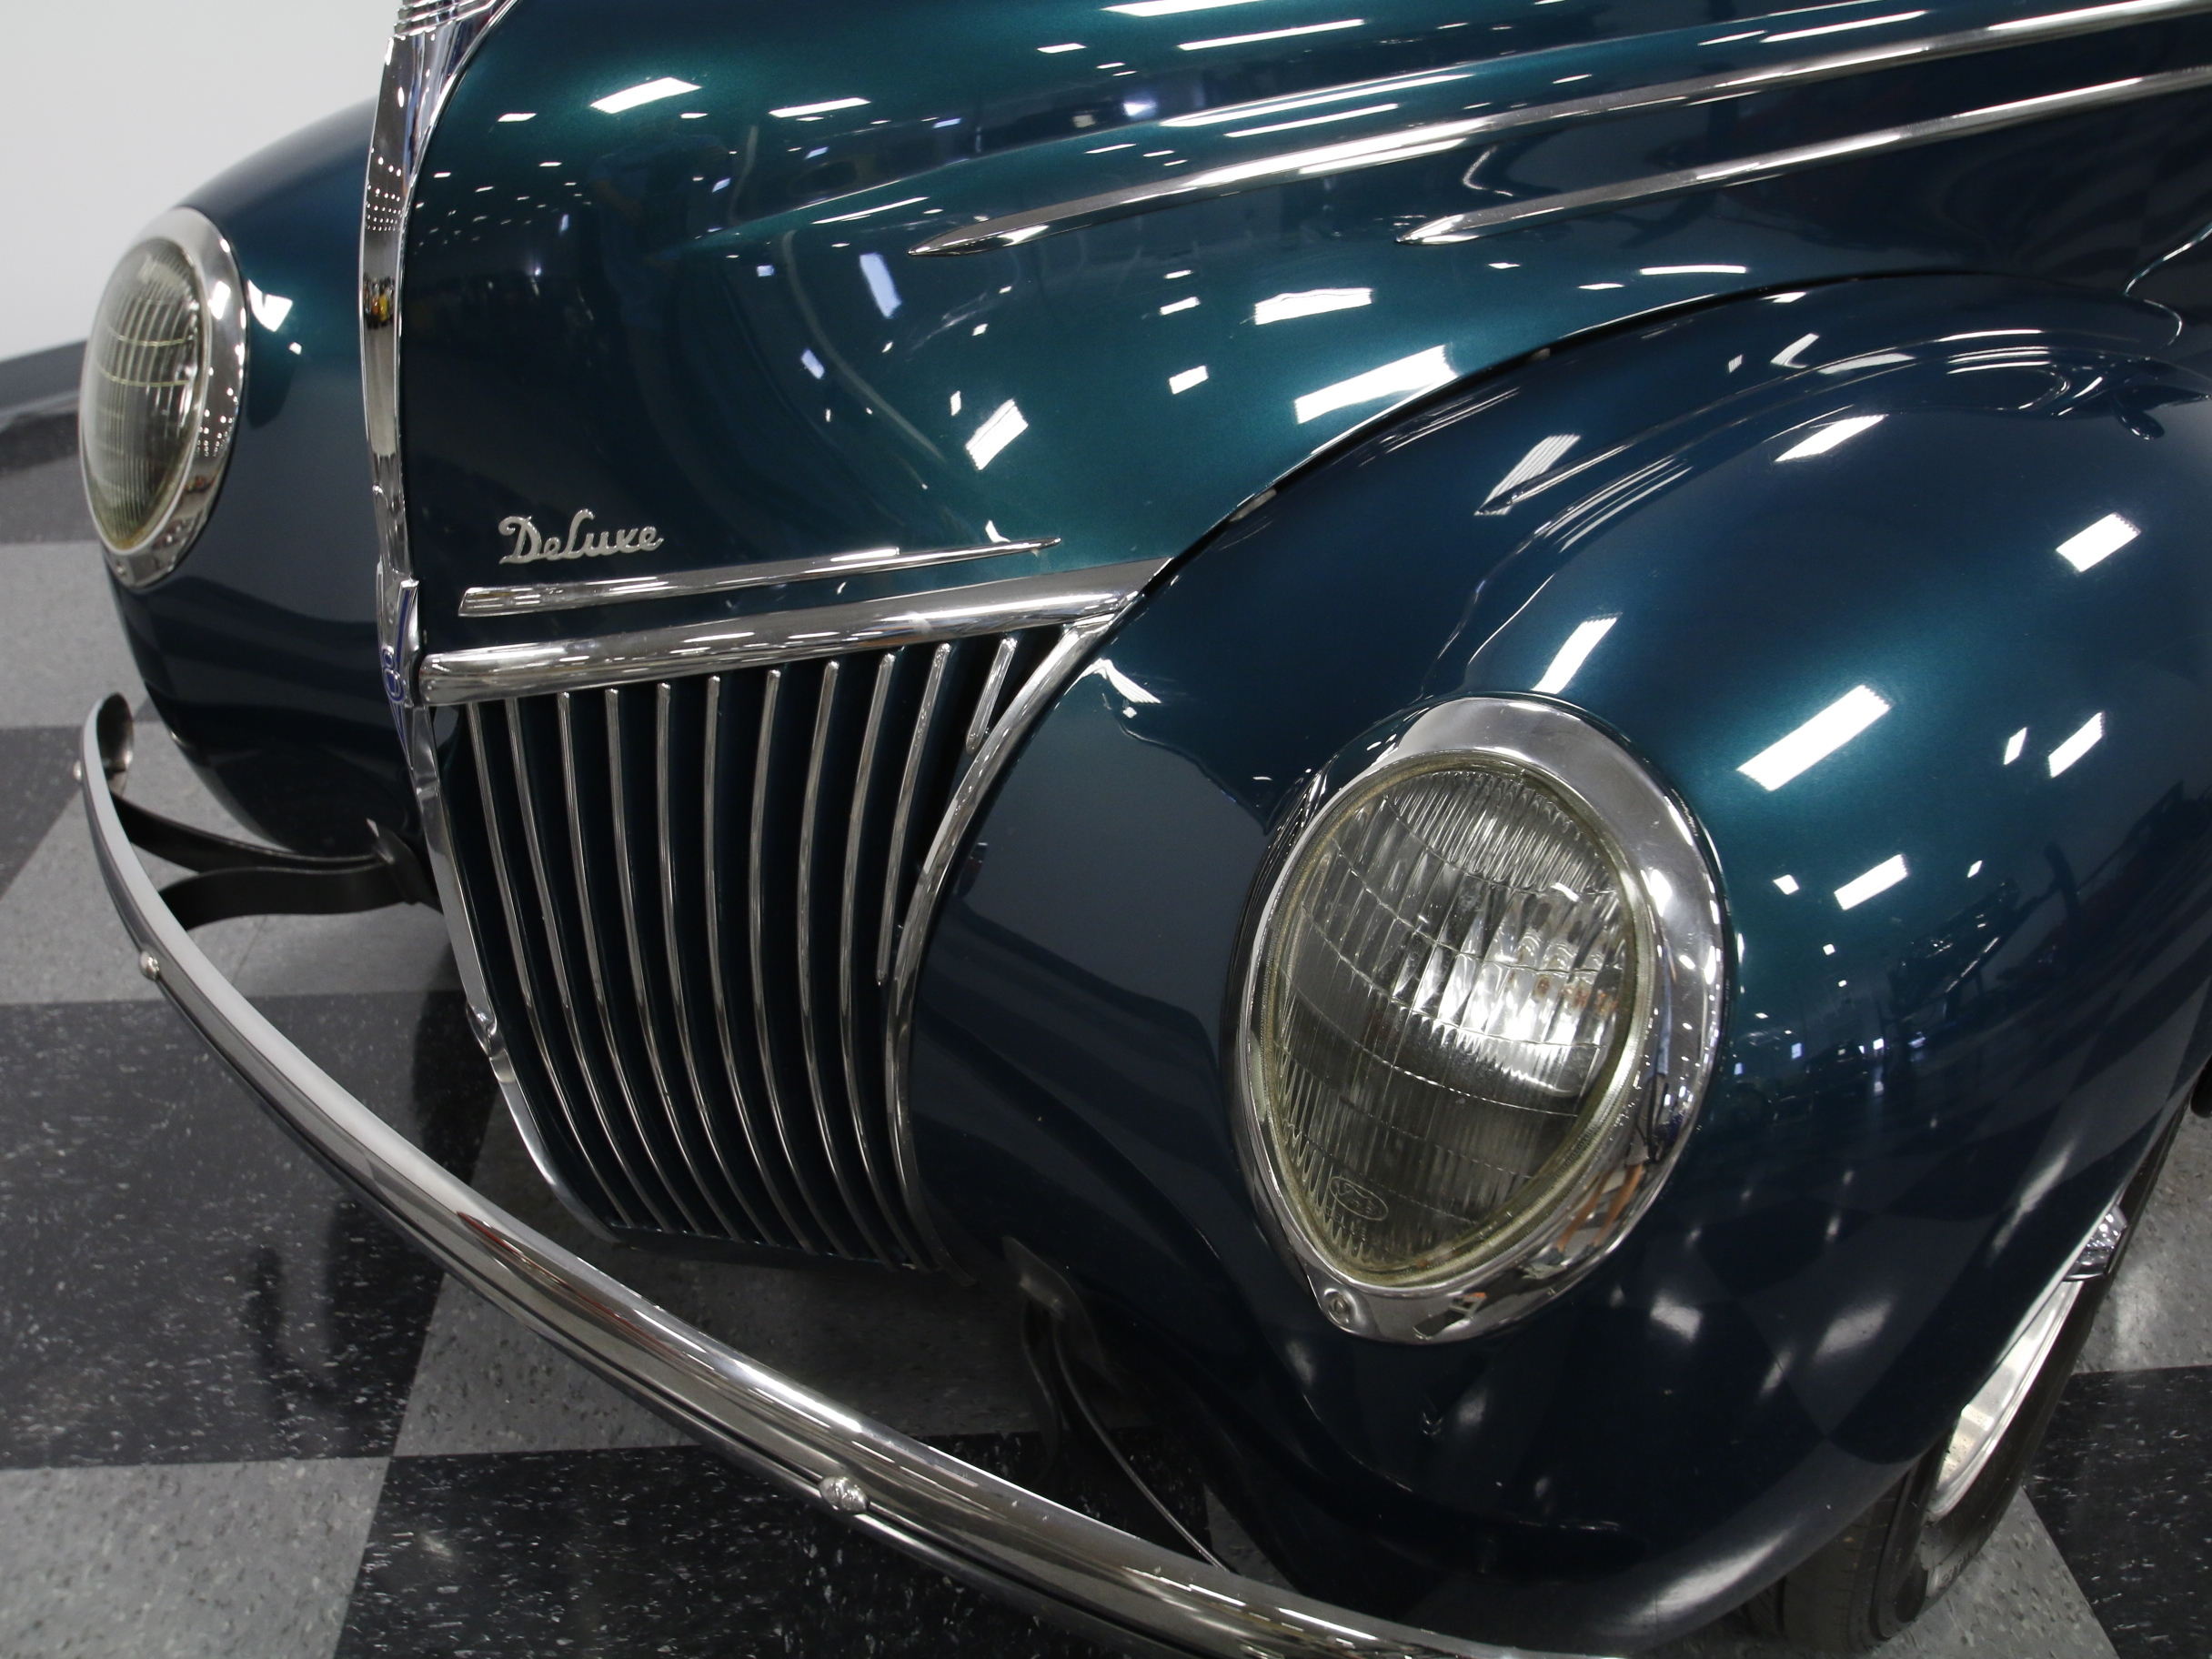 1939 Ford Deluxe | eBay